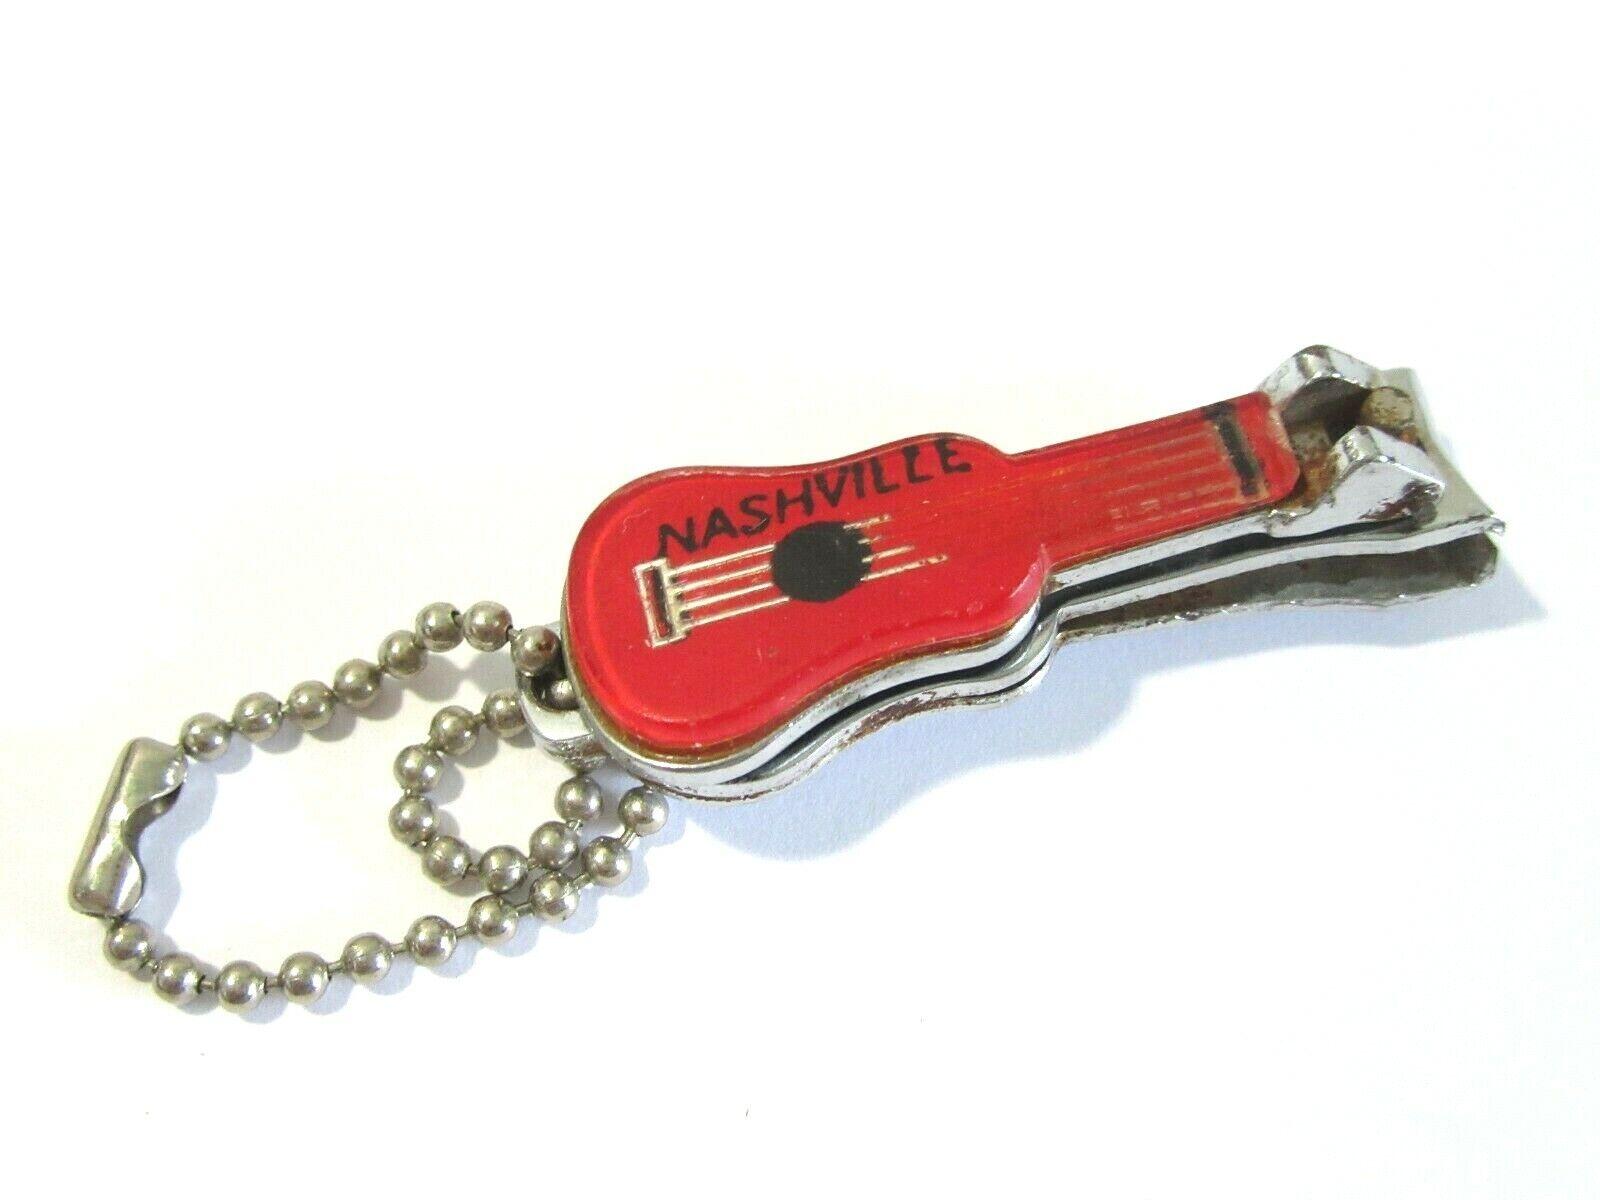 vintage keychain vintage collectibles guitar keychain keychain collection, Guitar nail clipper keychain